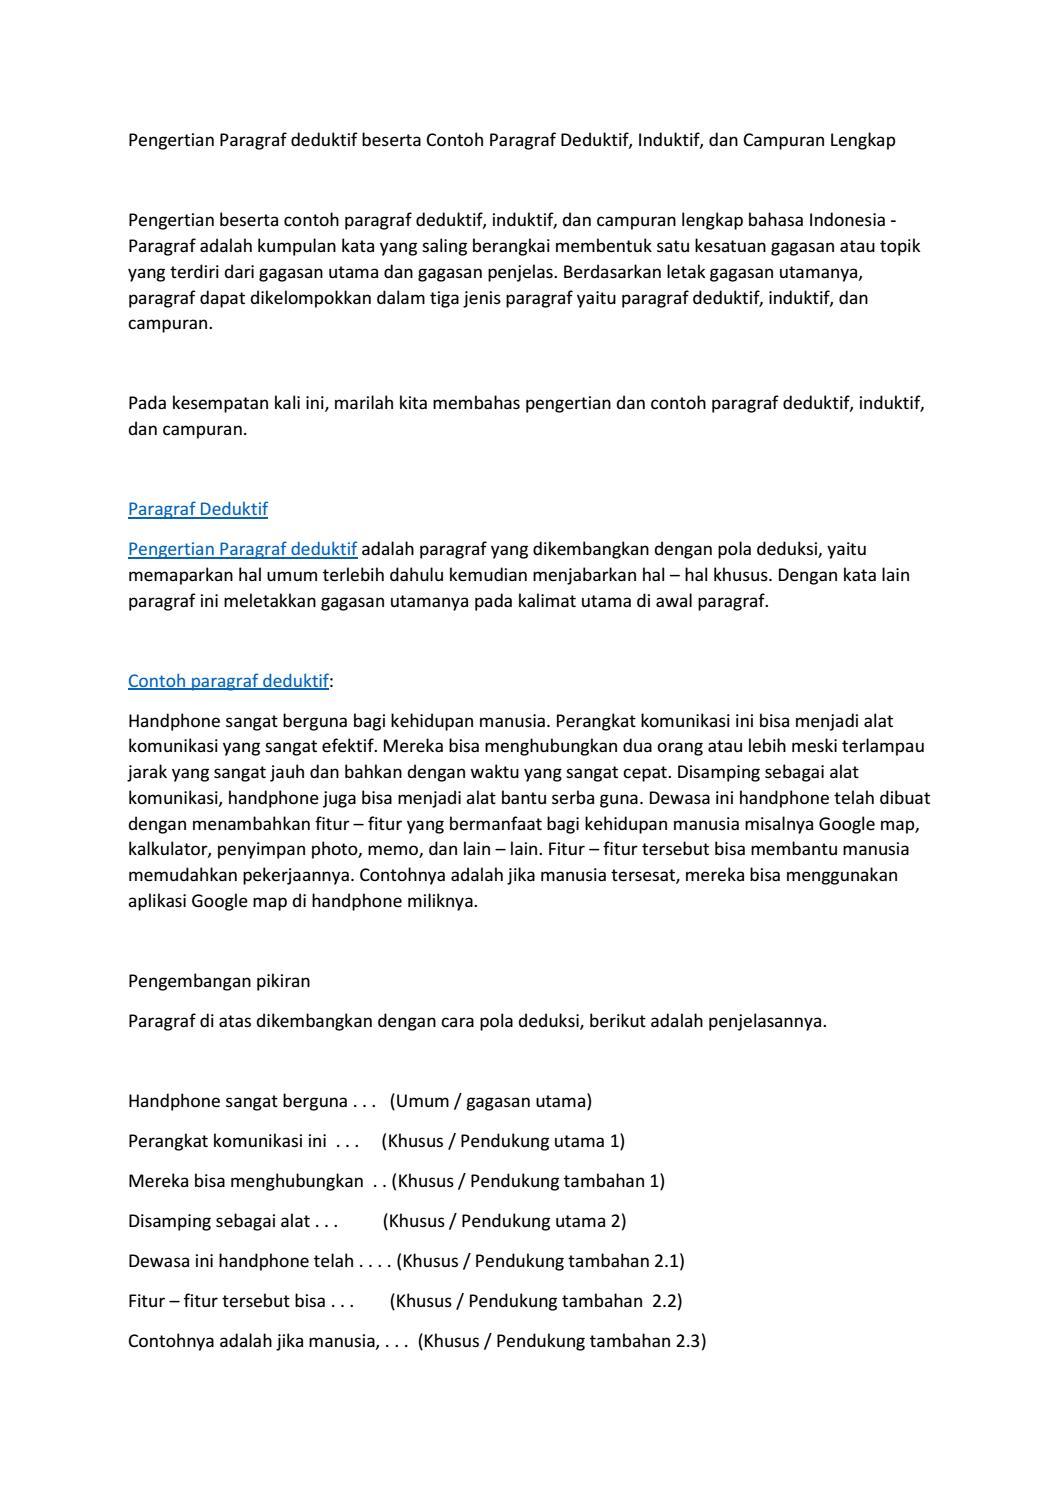 Pengertian Paragraf Deduktif Beserta Contoh Paragraf Deduktif By Joanne Henderson Issuu